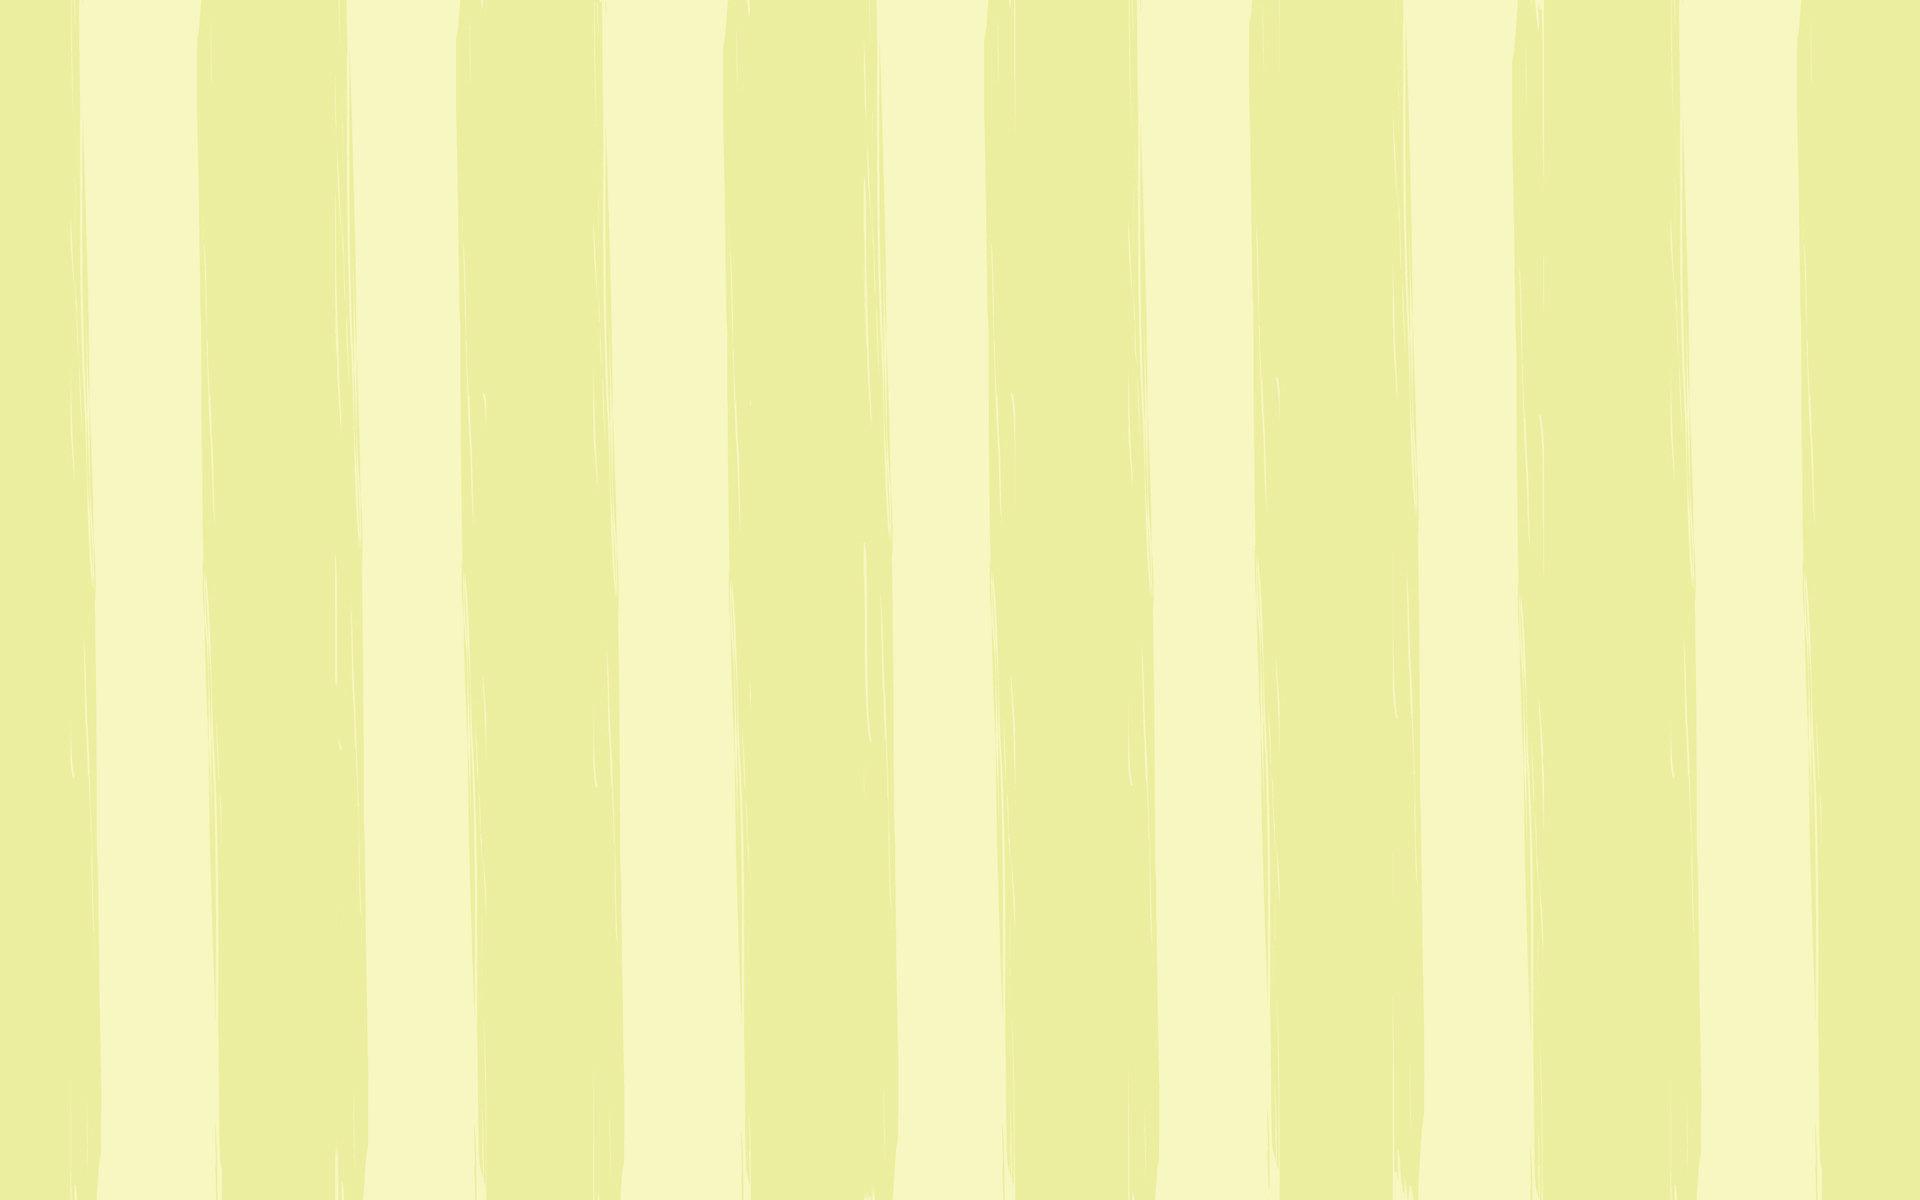 Stripe Wallpaper 41 Wallpapers Hd Wallpapers